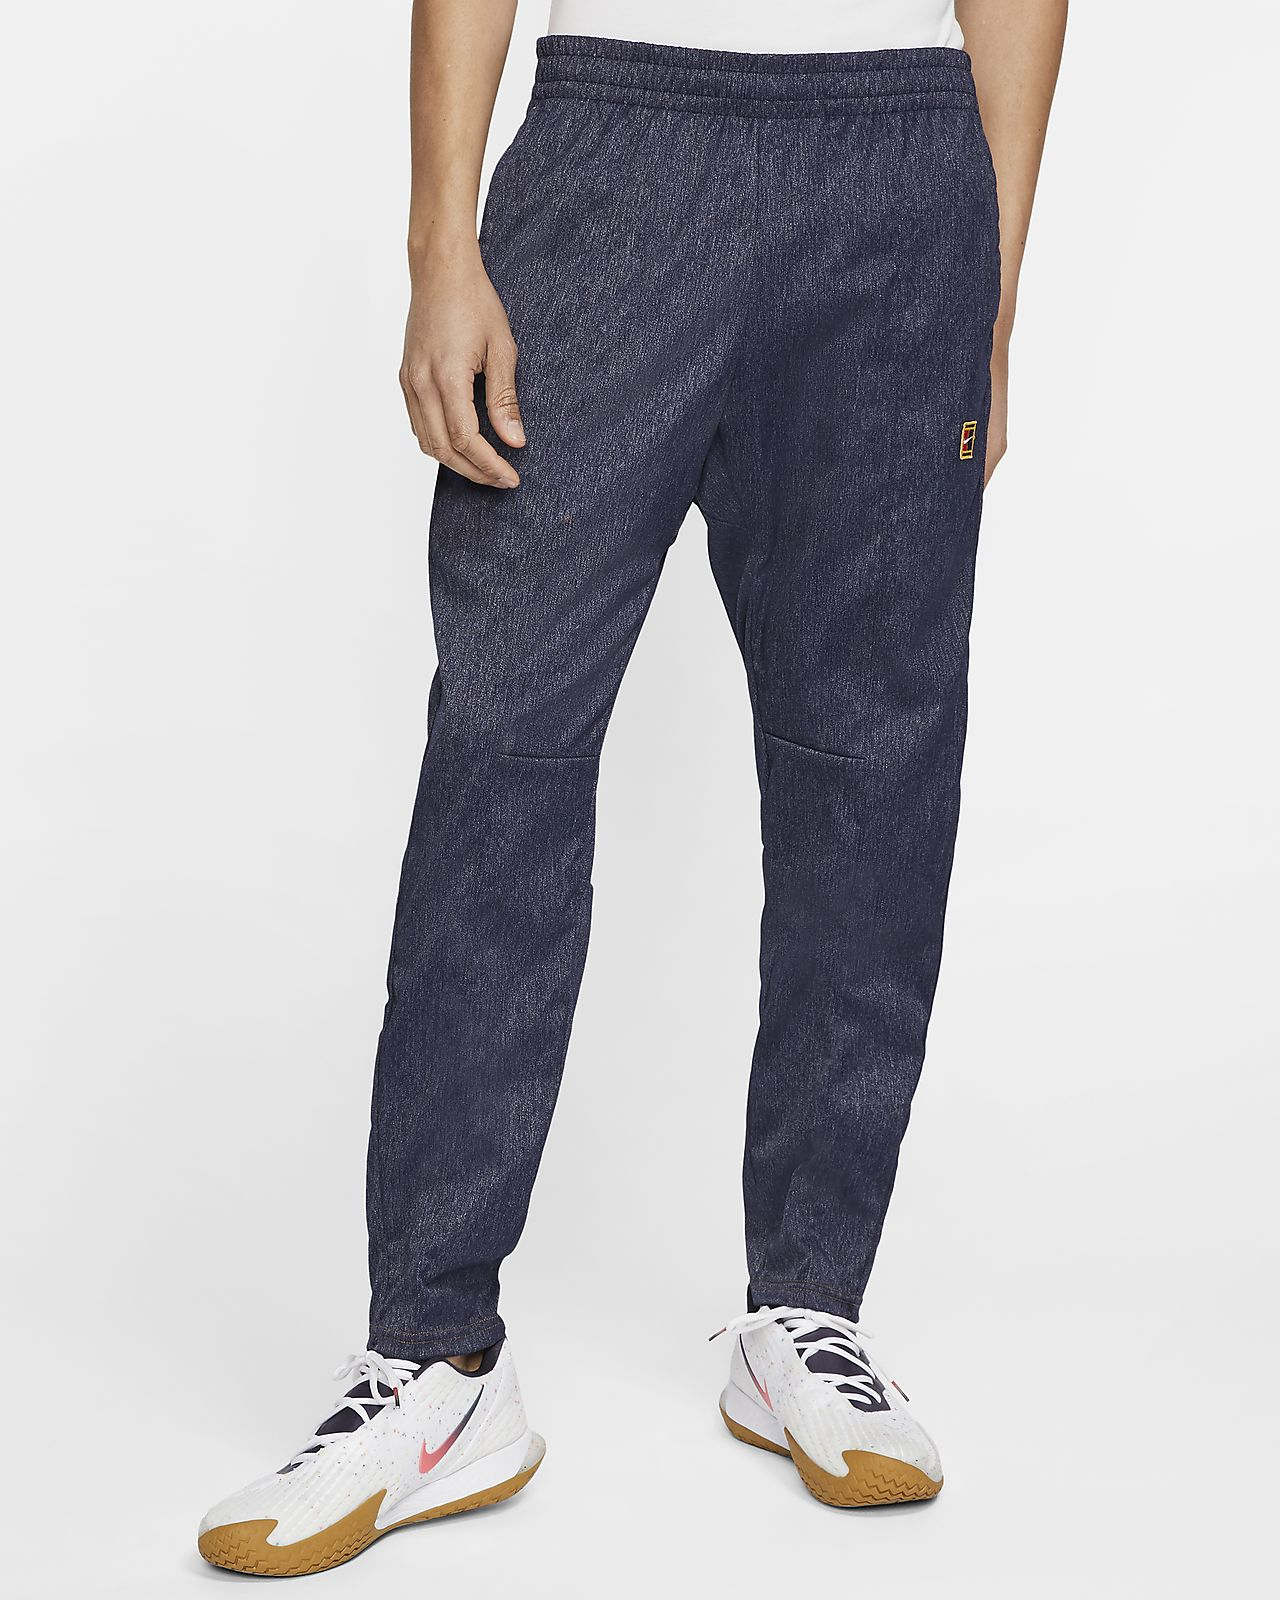 NikeCourt Men's Tennis Trousers. Nike LU